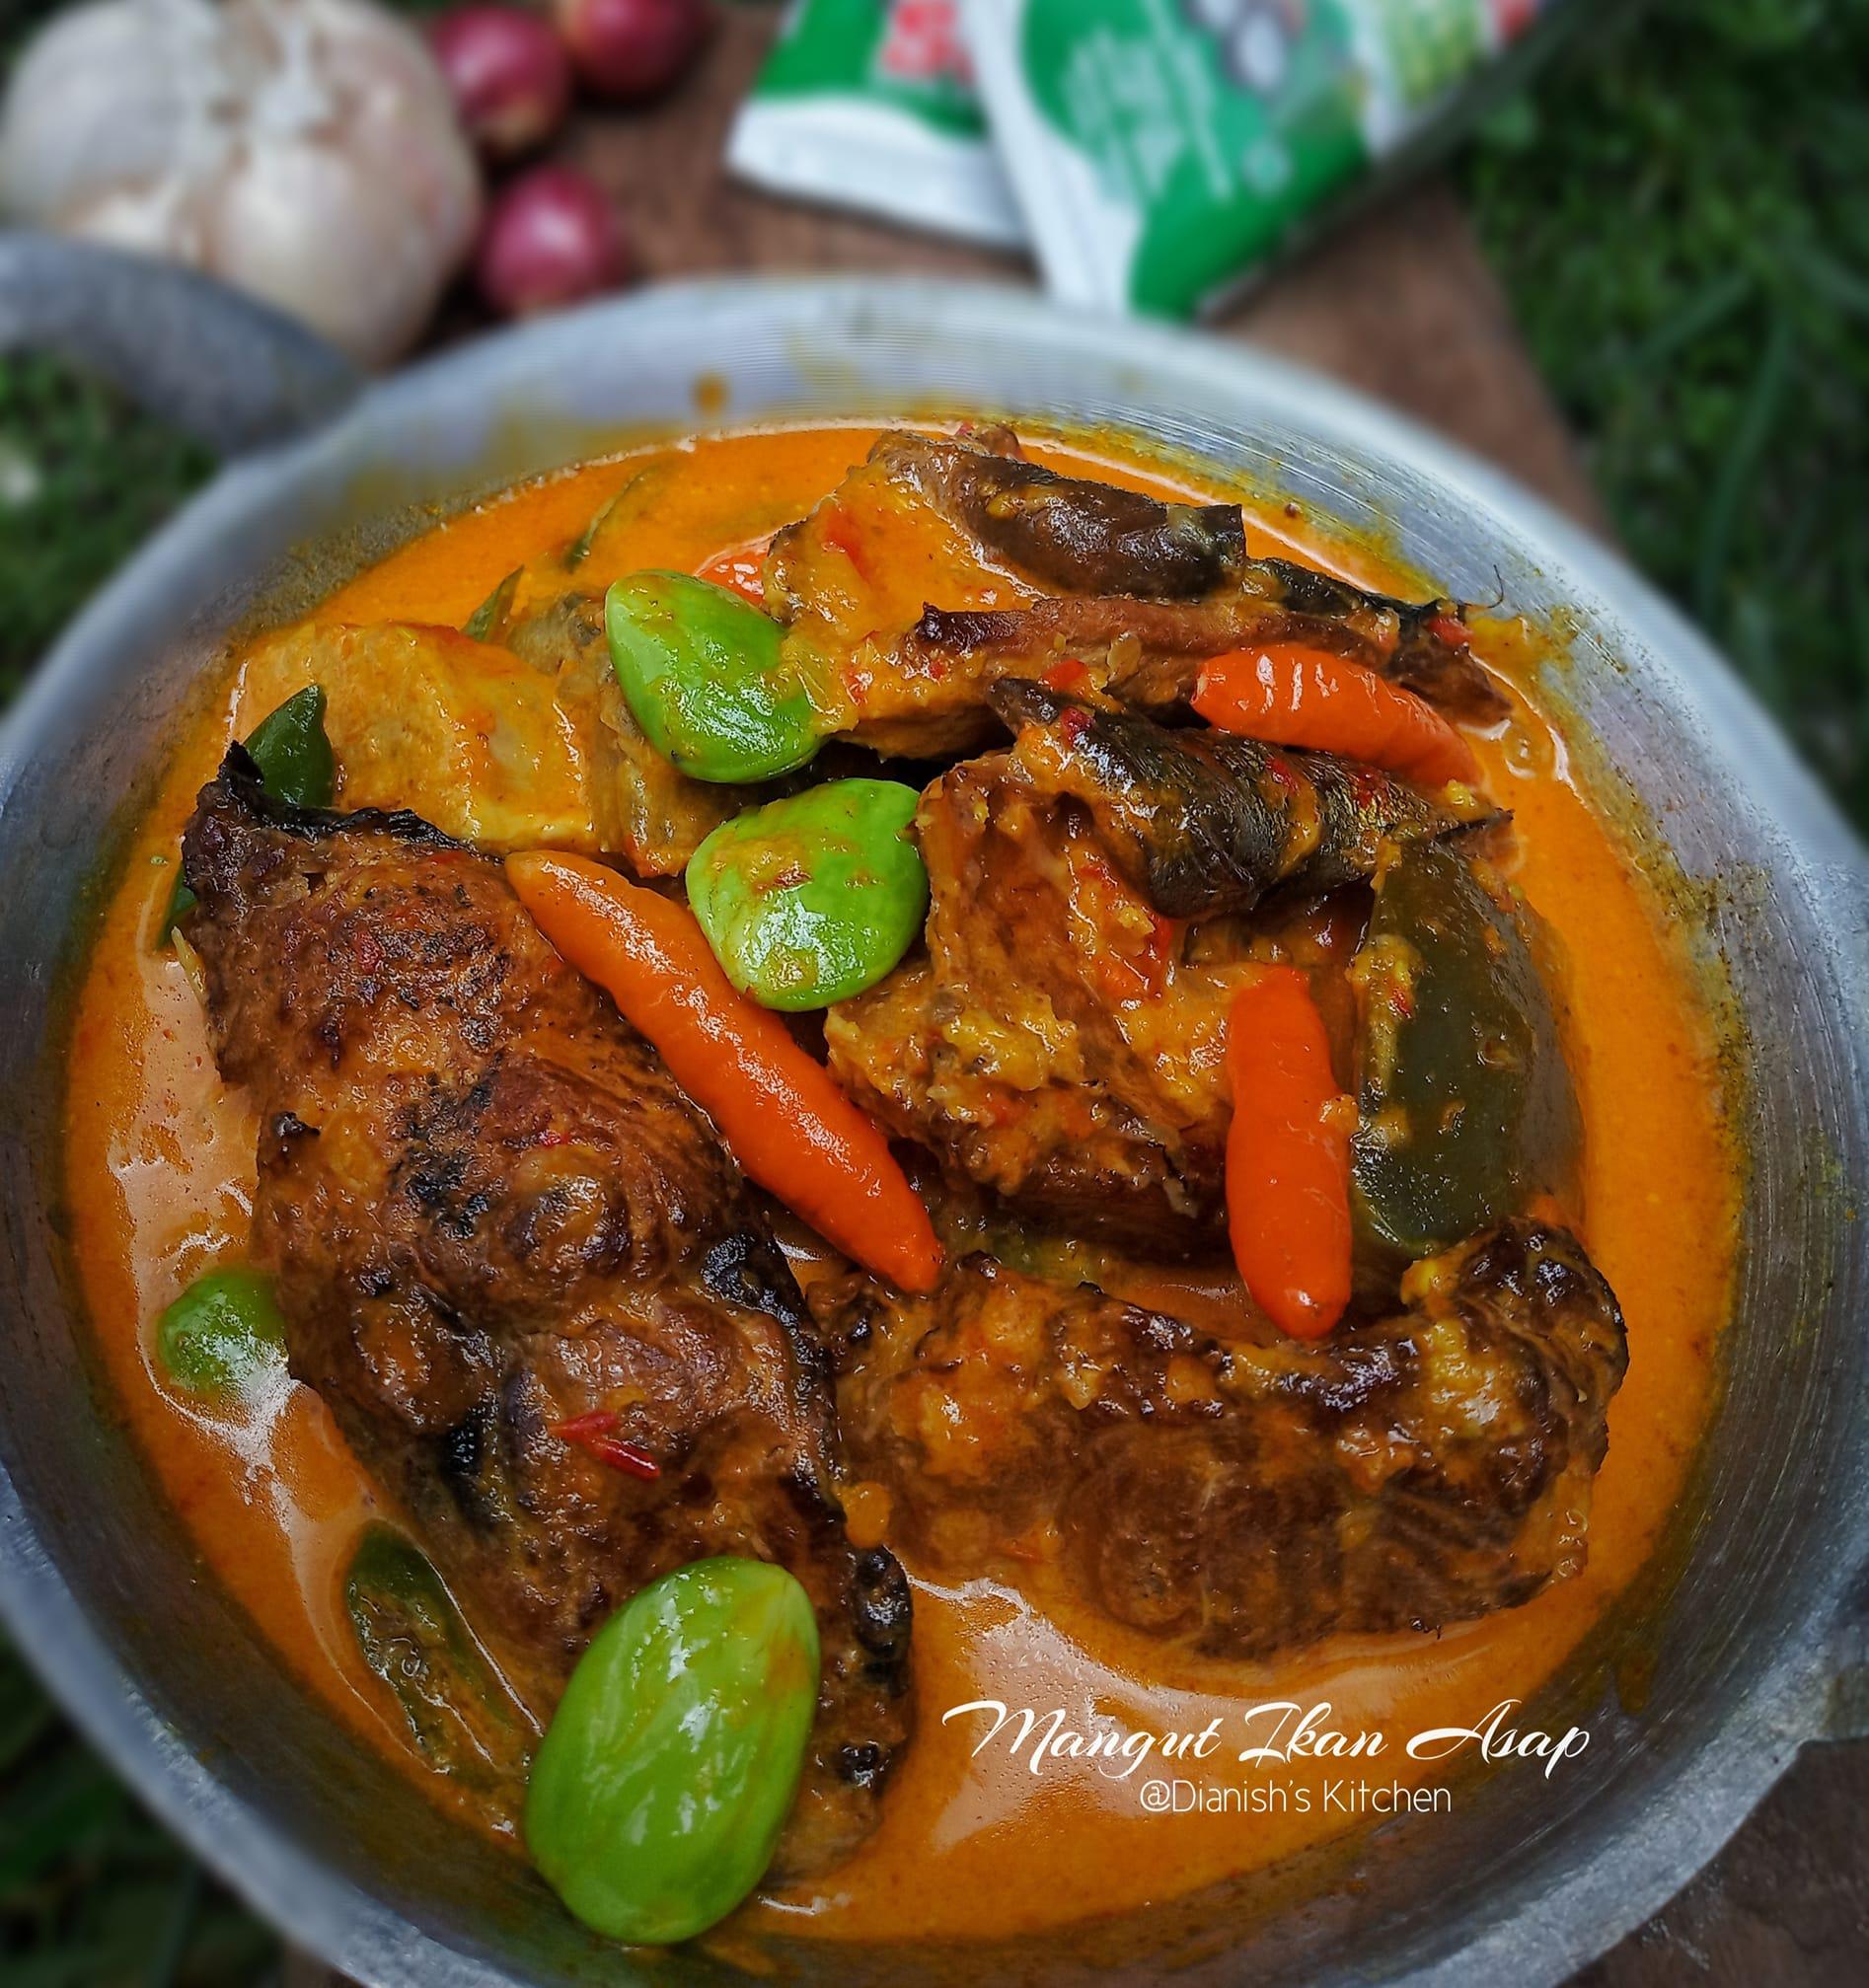 Resep Mangut Ikan Asap By Dianish S Kitchen Langsungenak Com